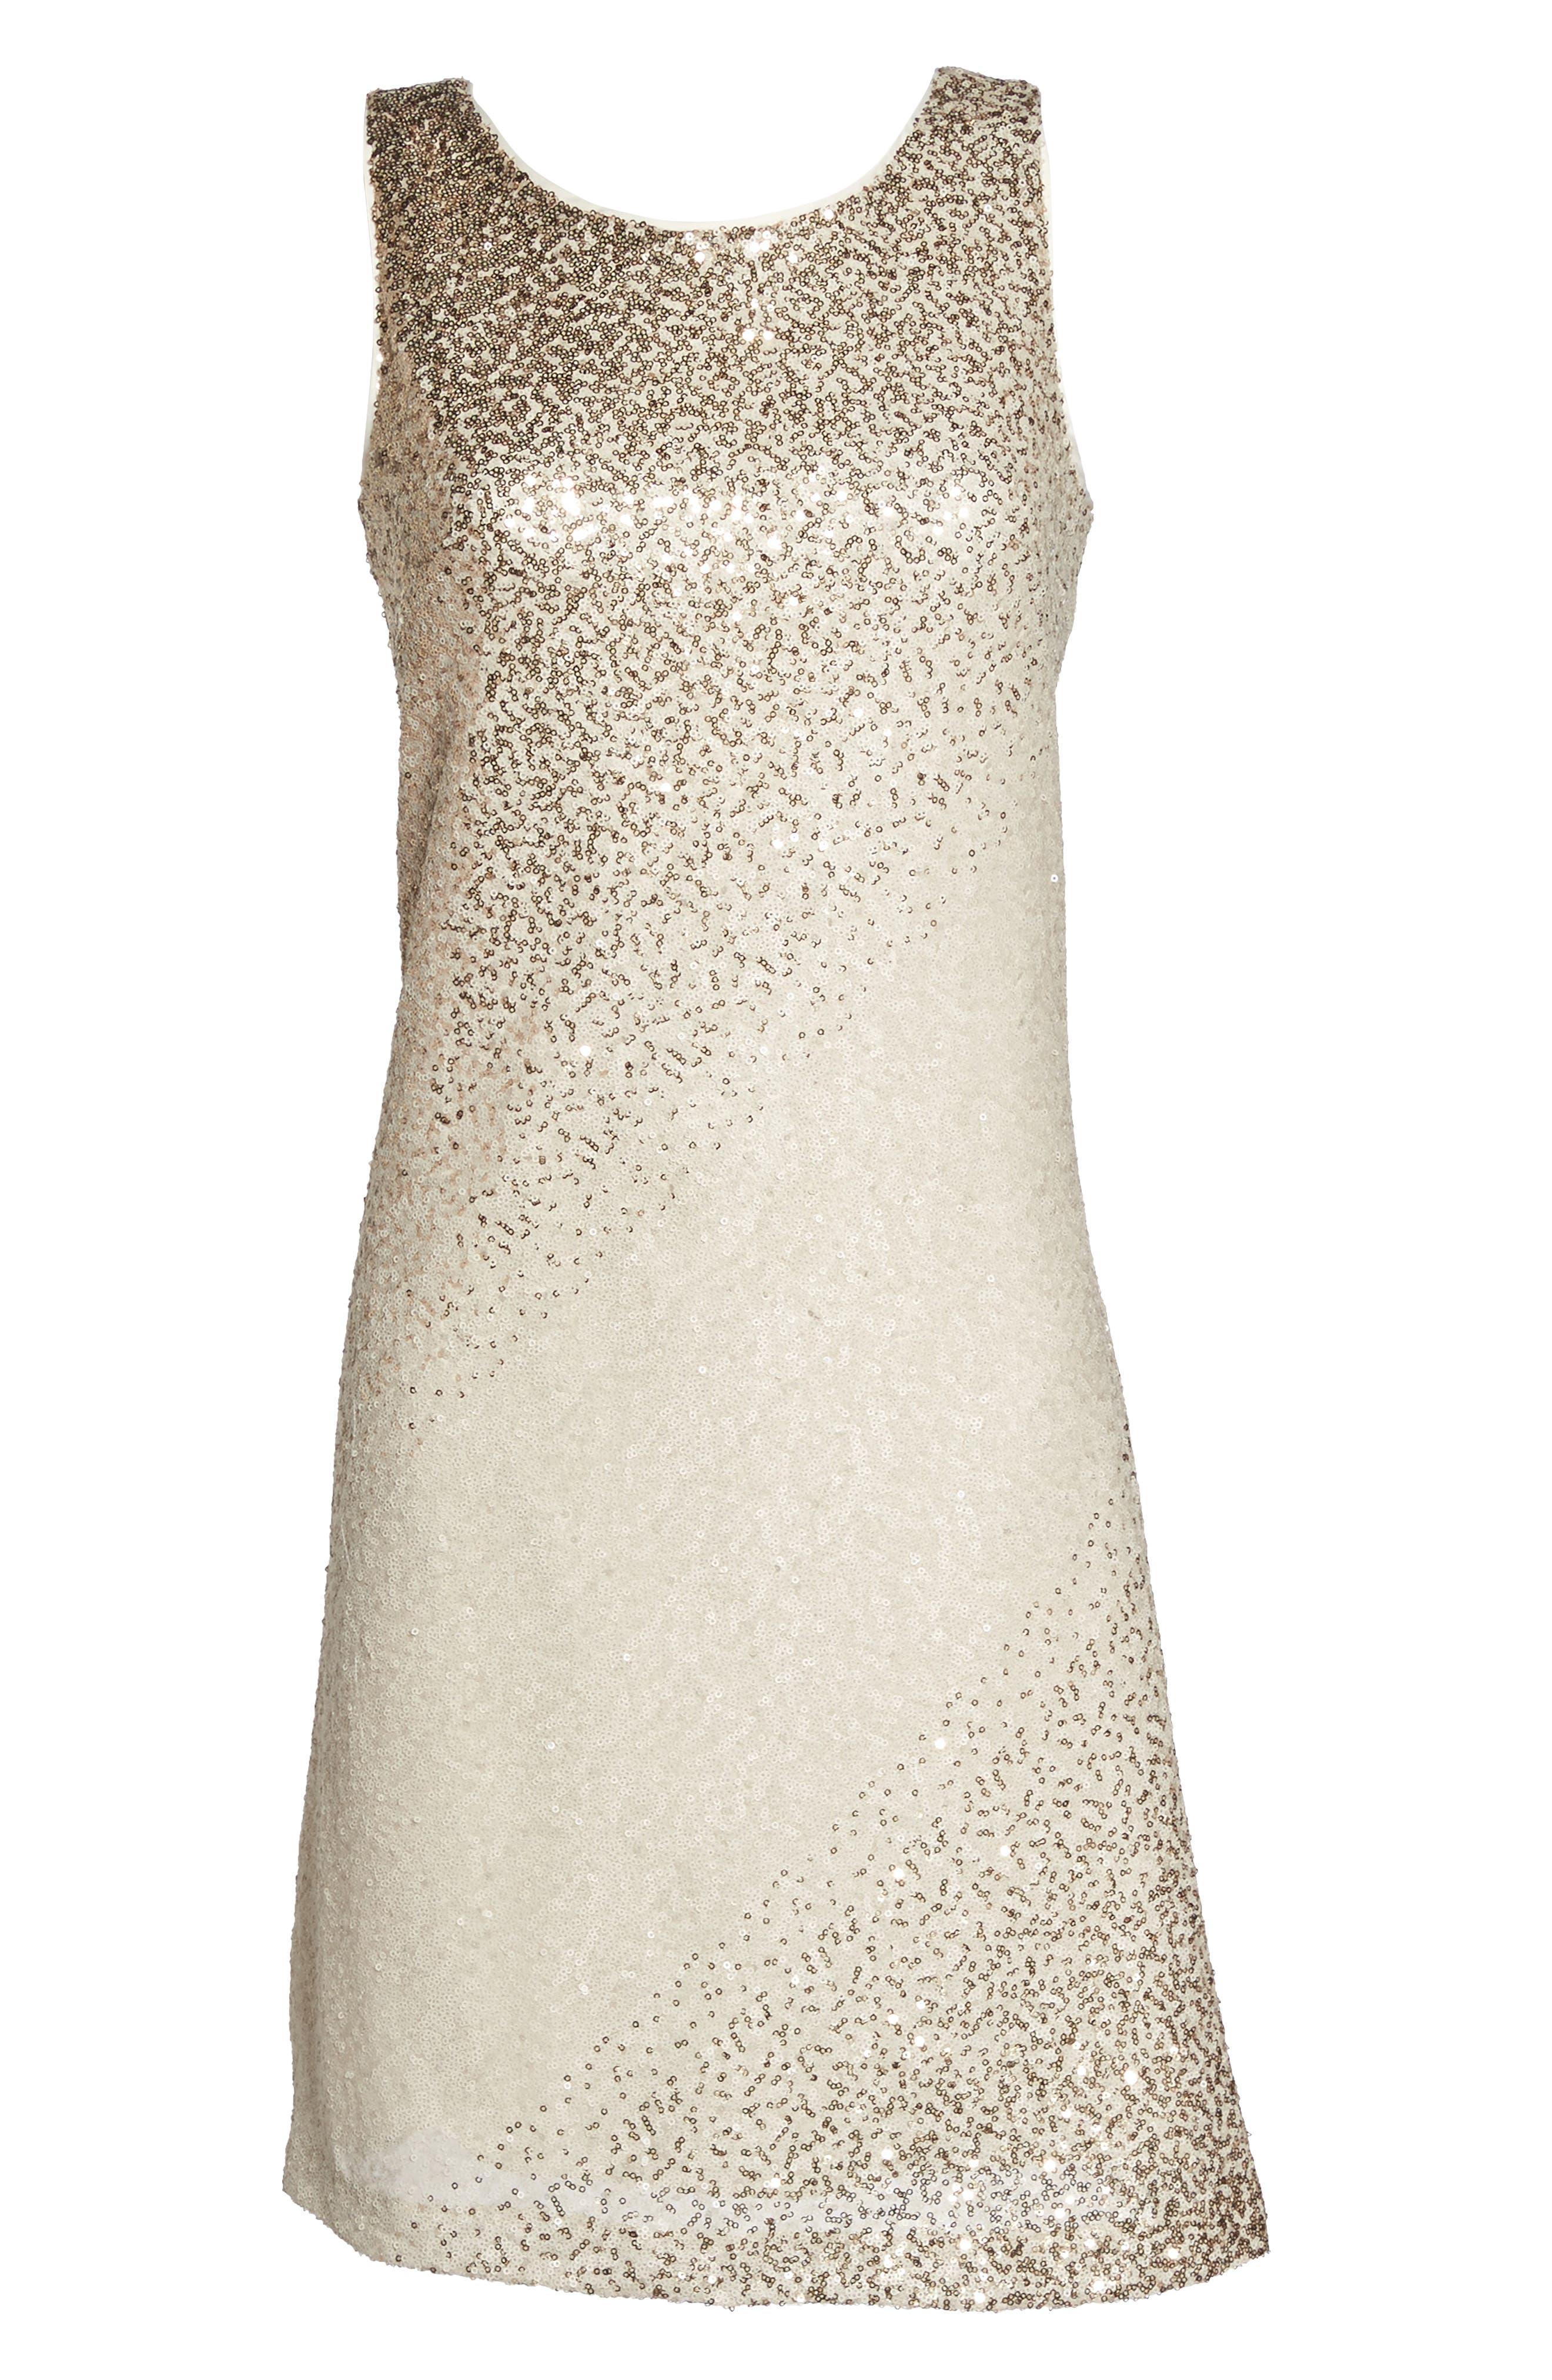 Sequin Shift Dress,                             Alternate thumbnail 6, color,